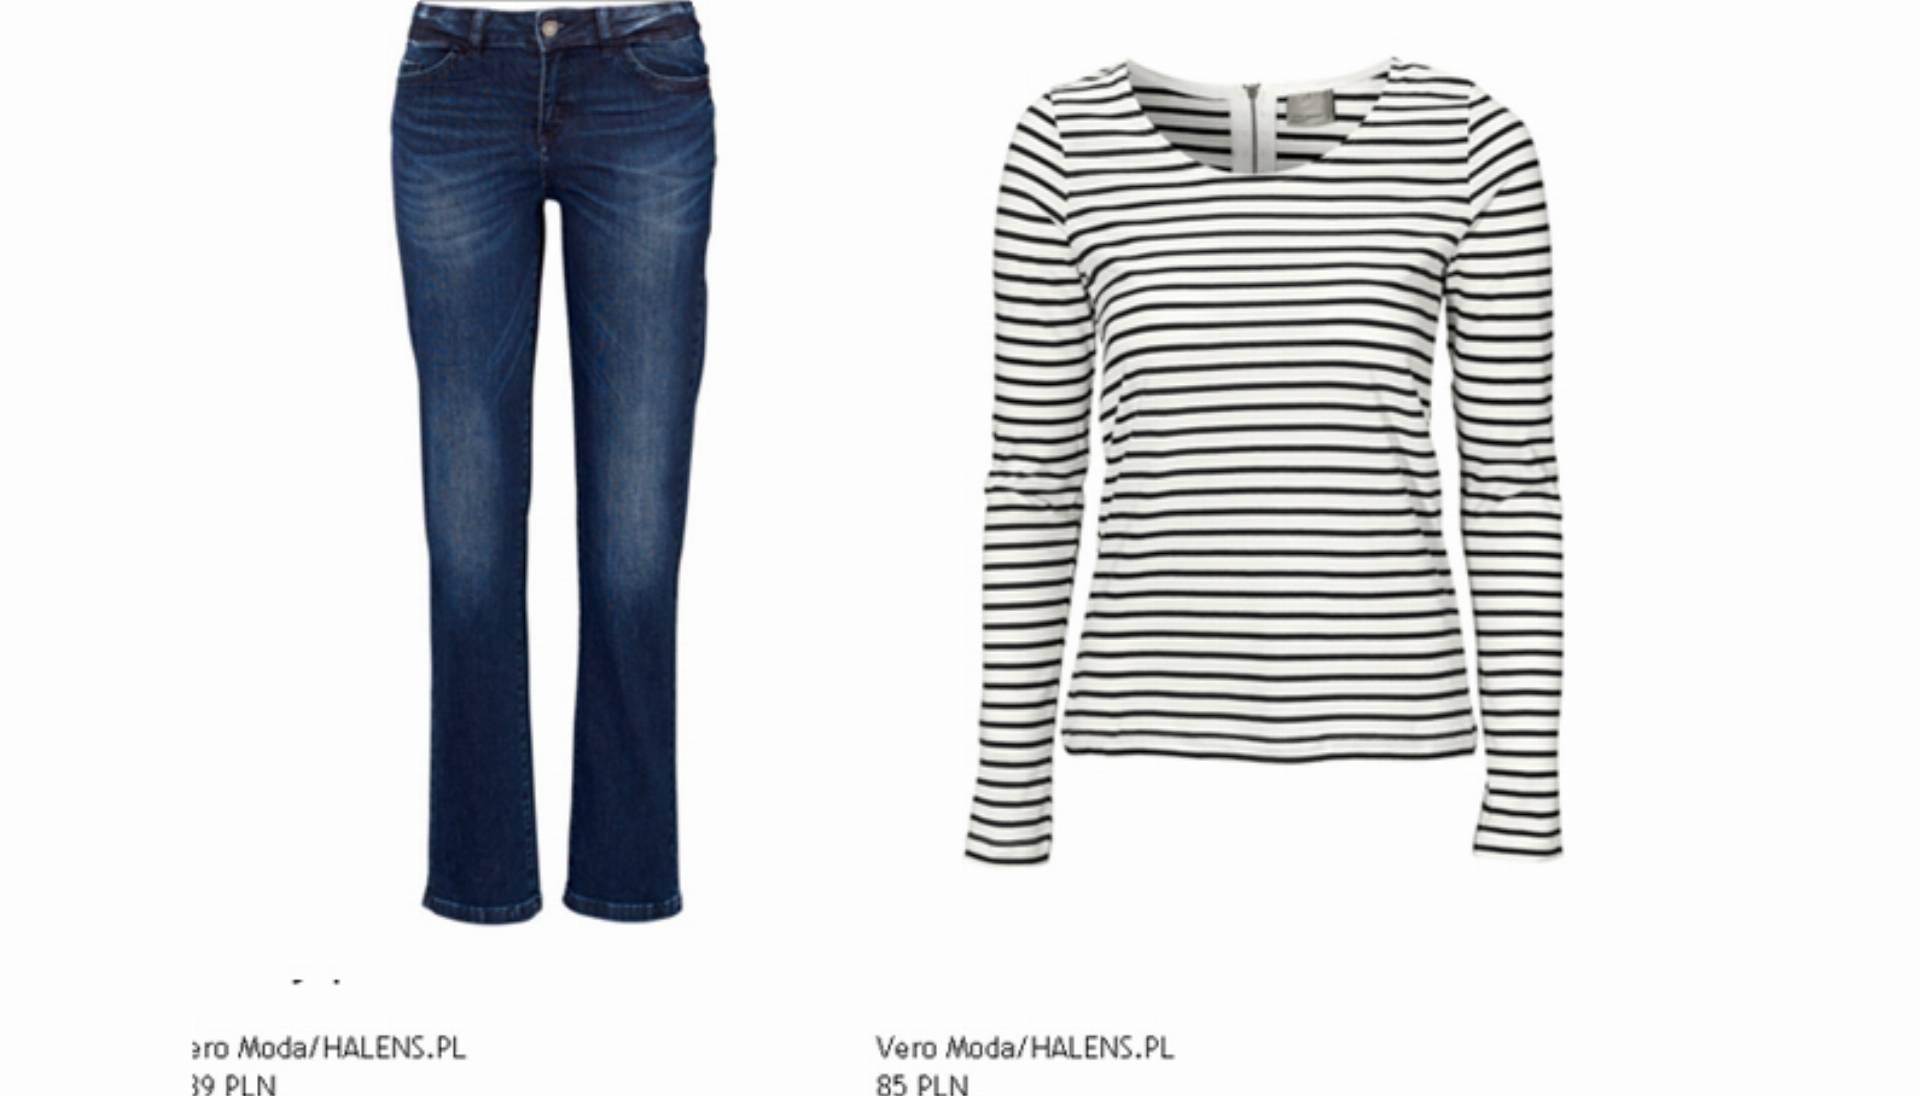 jeansy-modne-2016-3